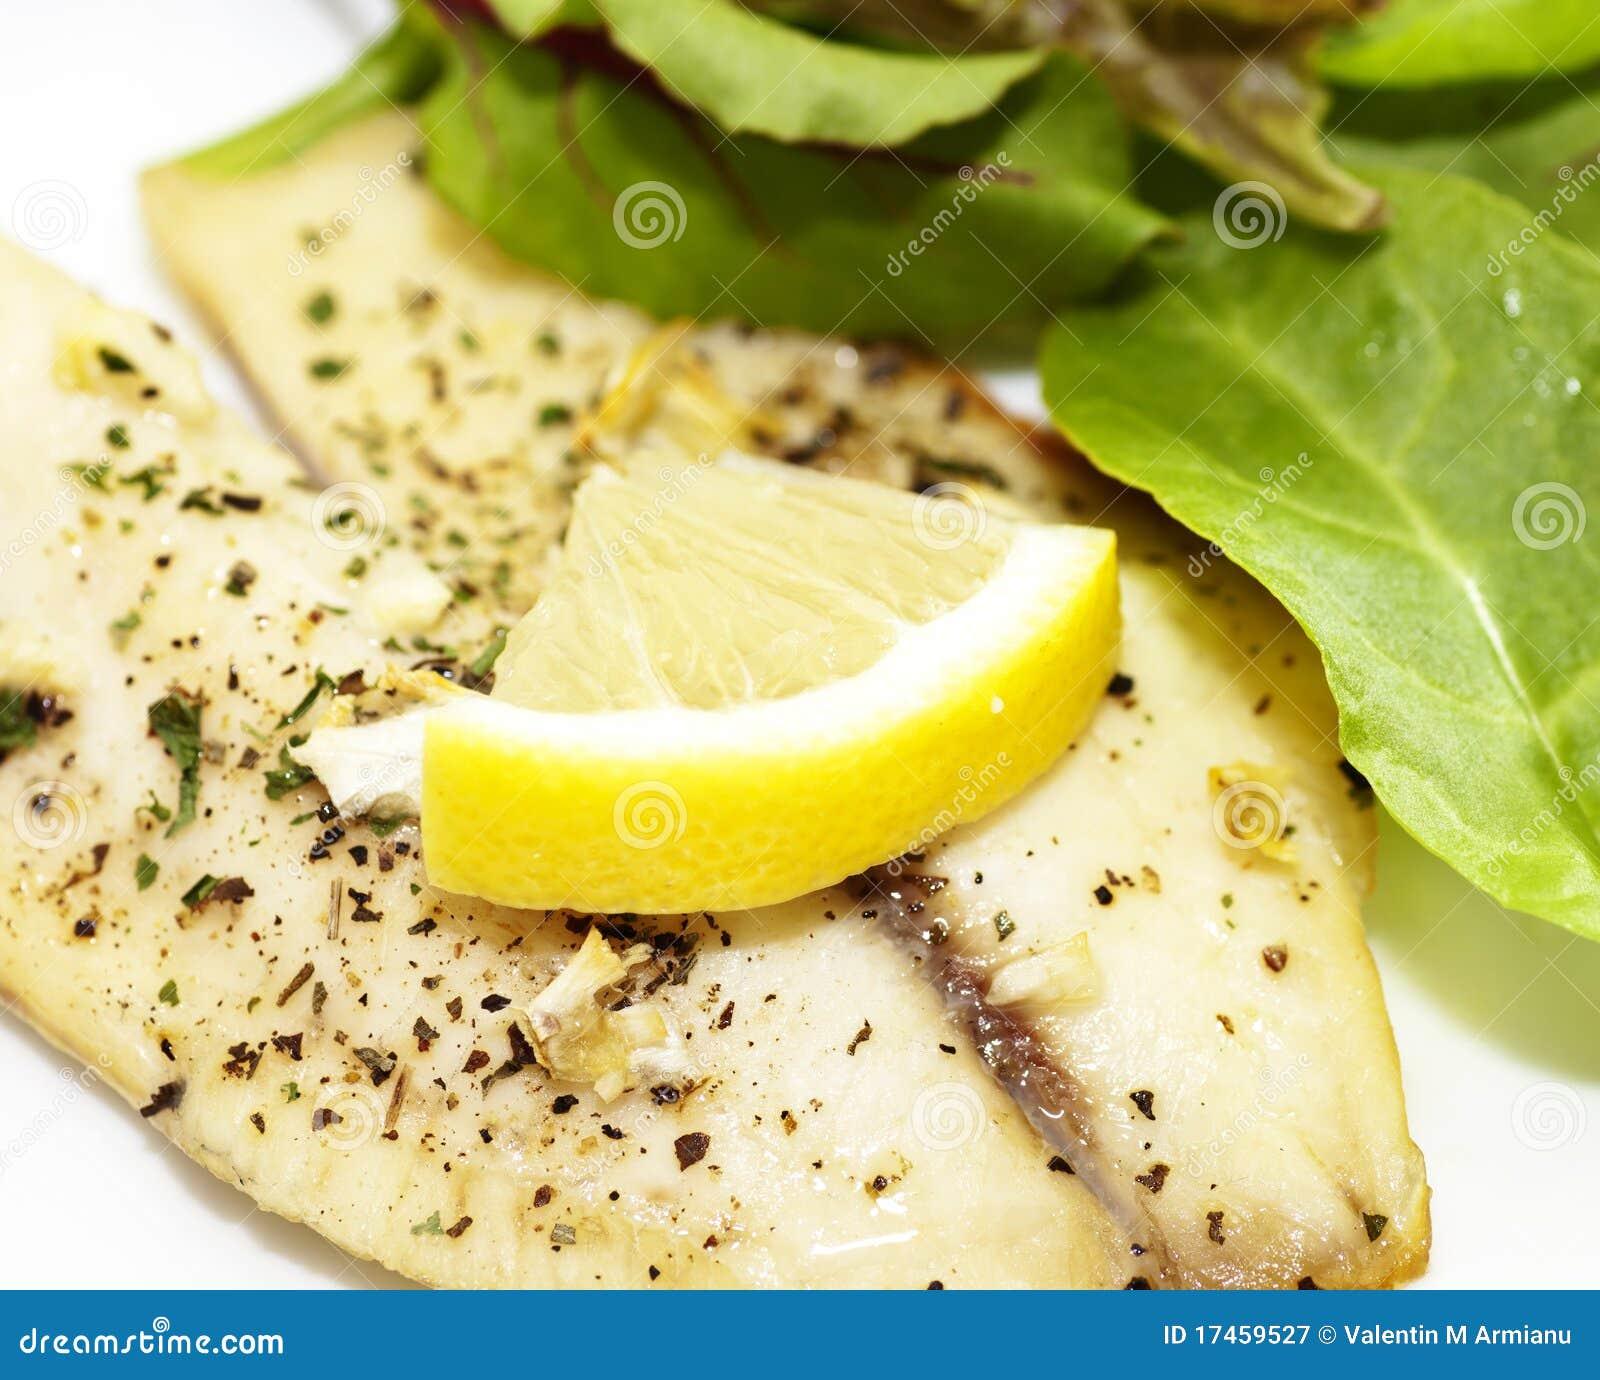 Baked fish royalty free stock photography image 17459527 for Baked fish seasoning